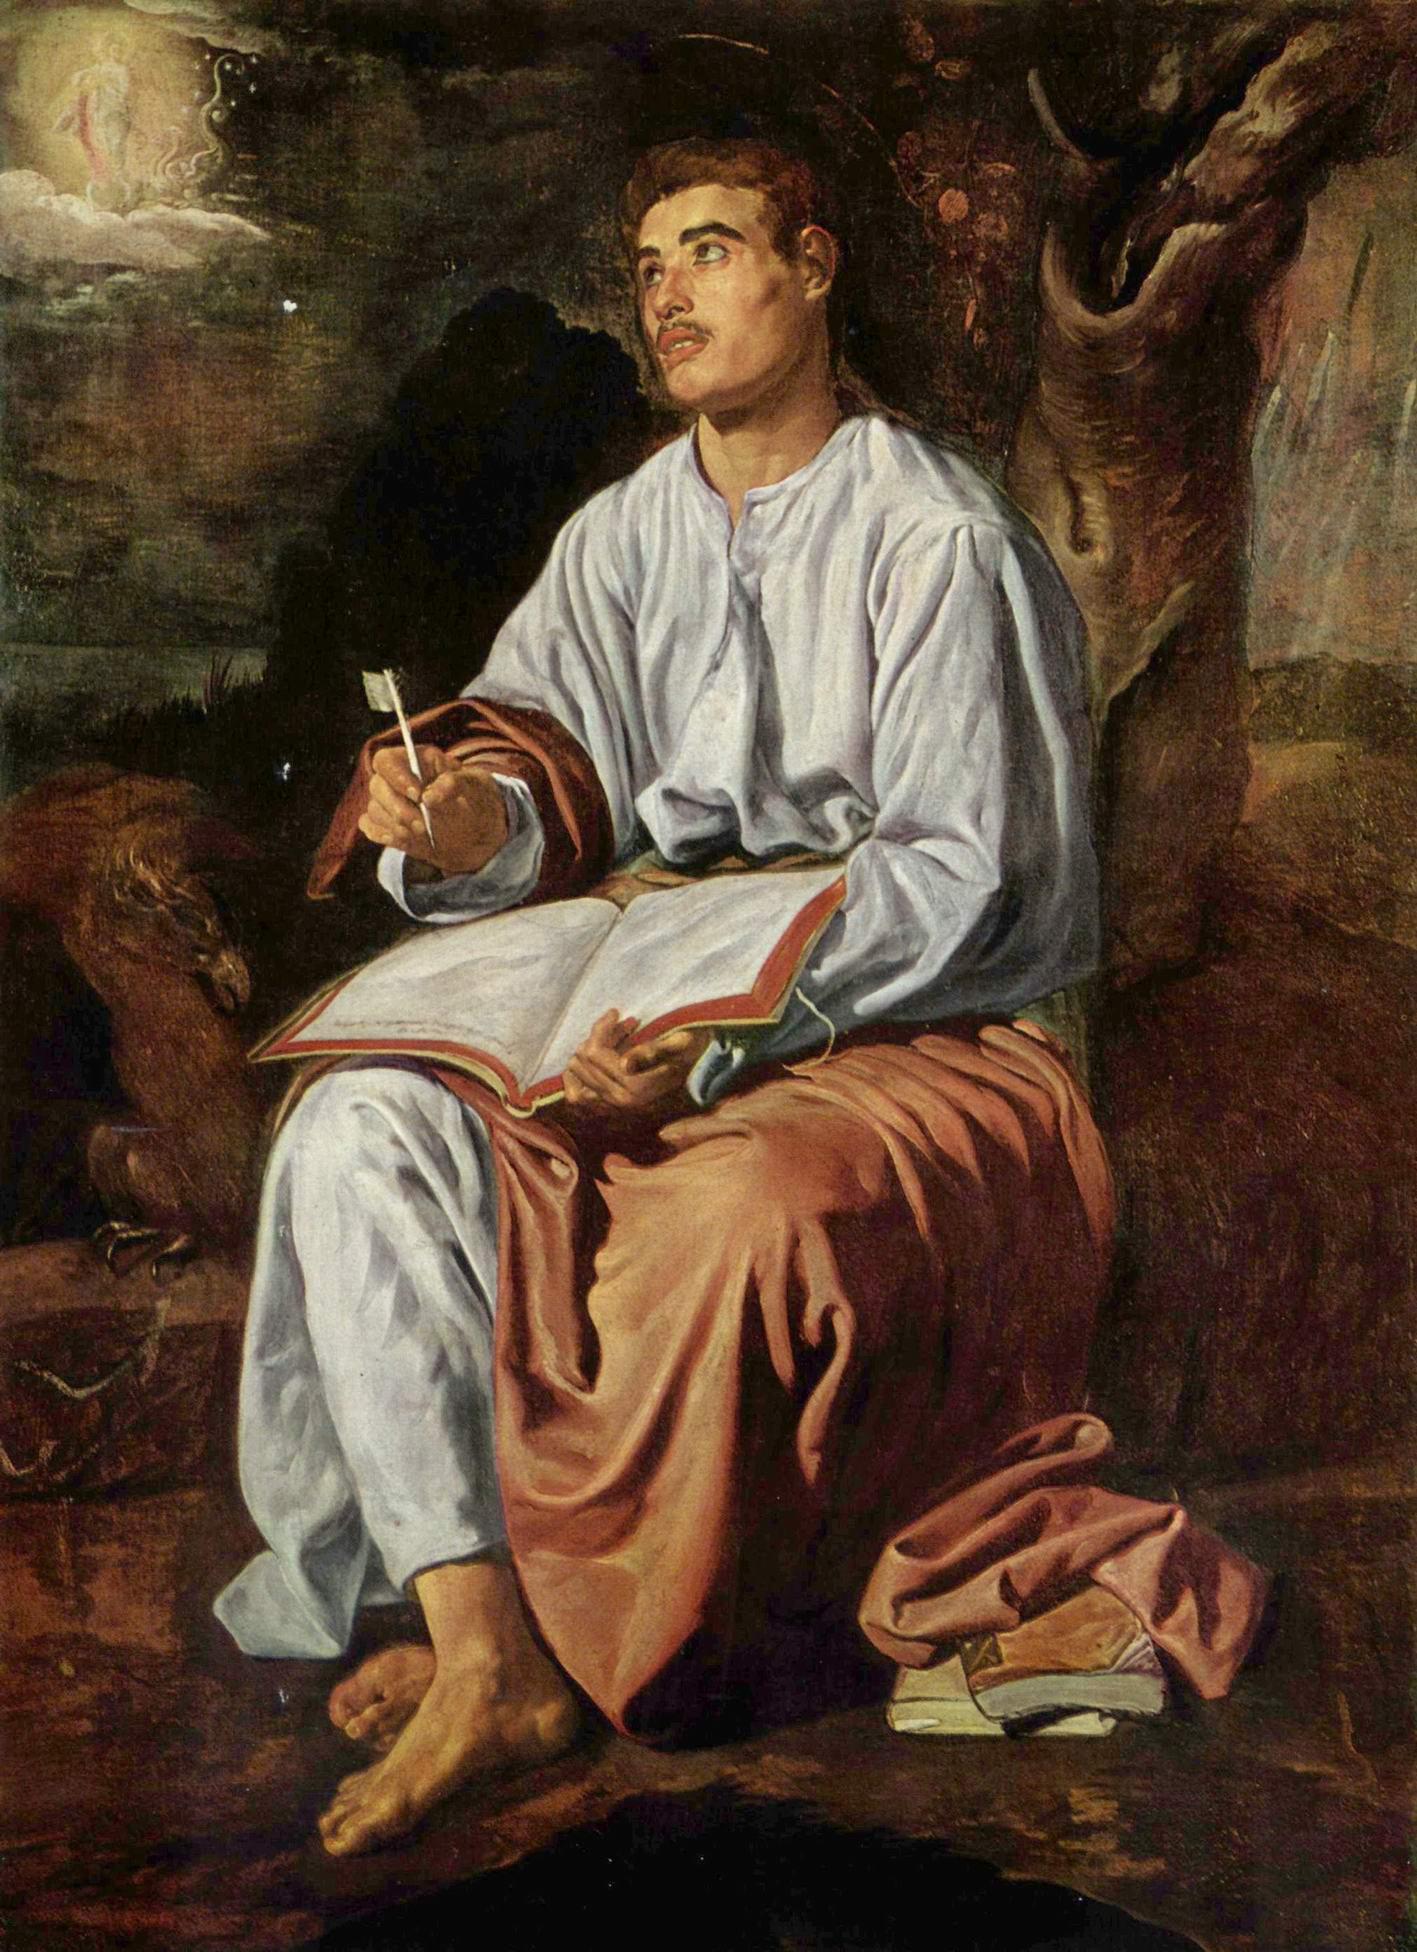 Евангелист Иоанн на Патмосе, Диего Веласкес